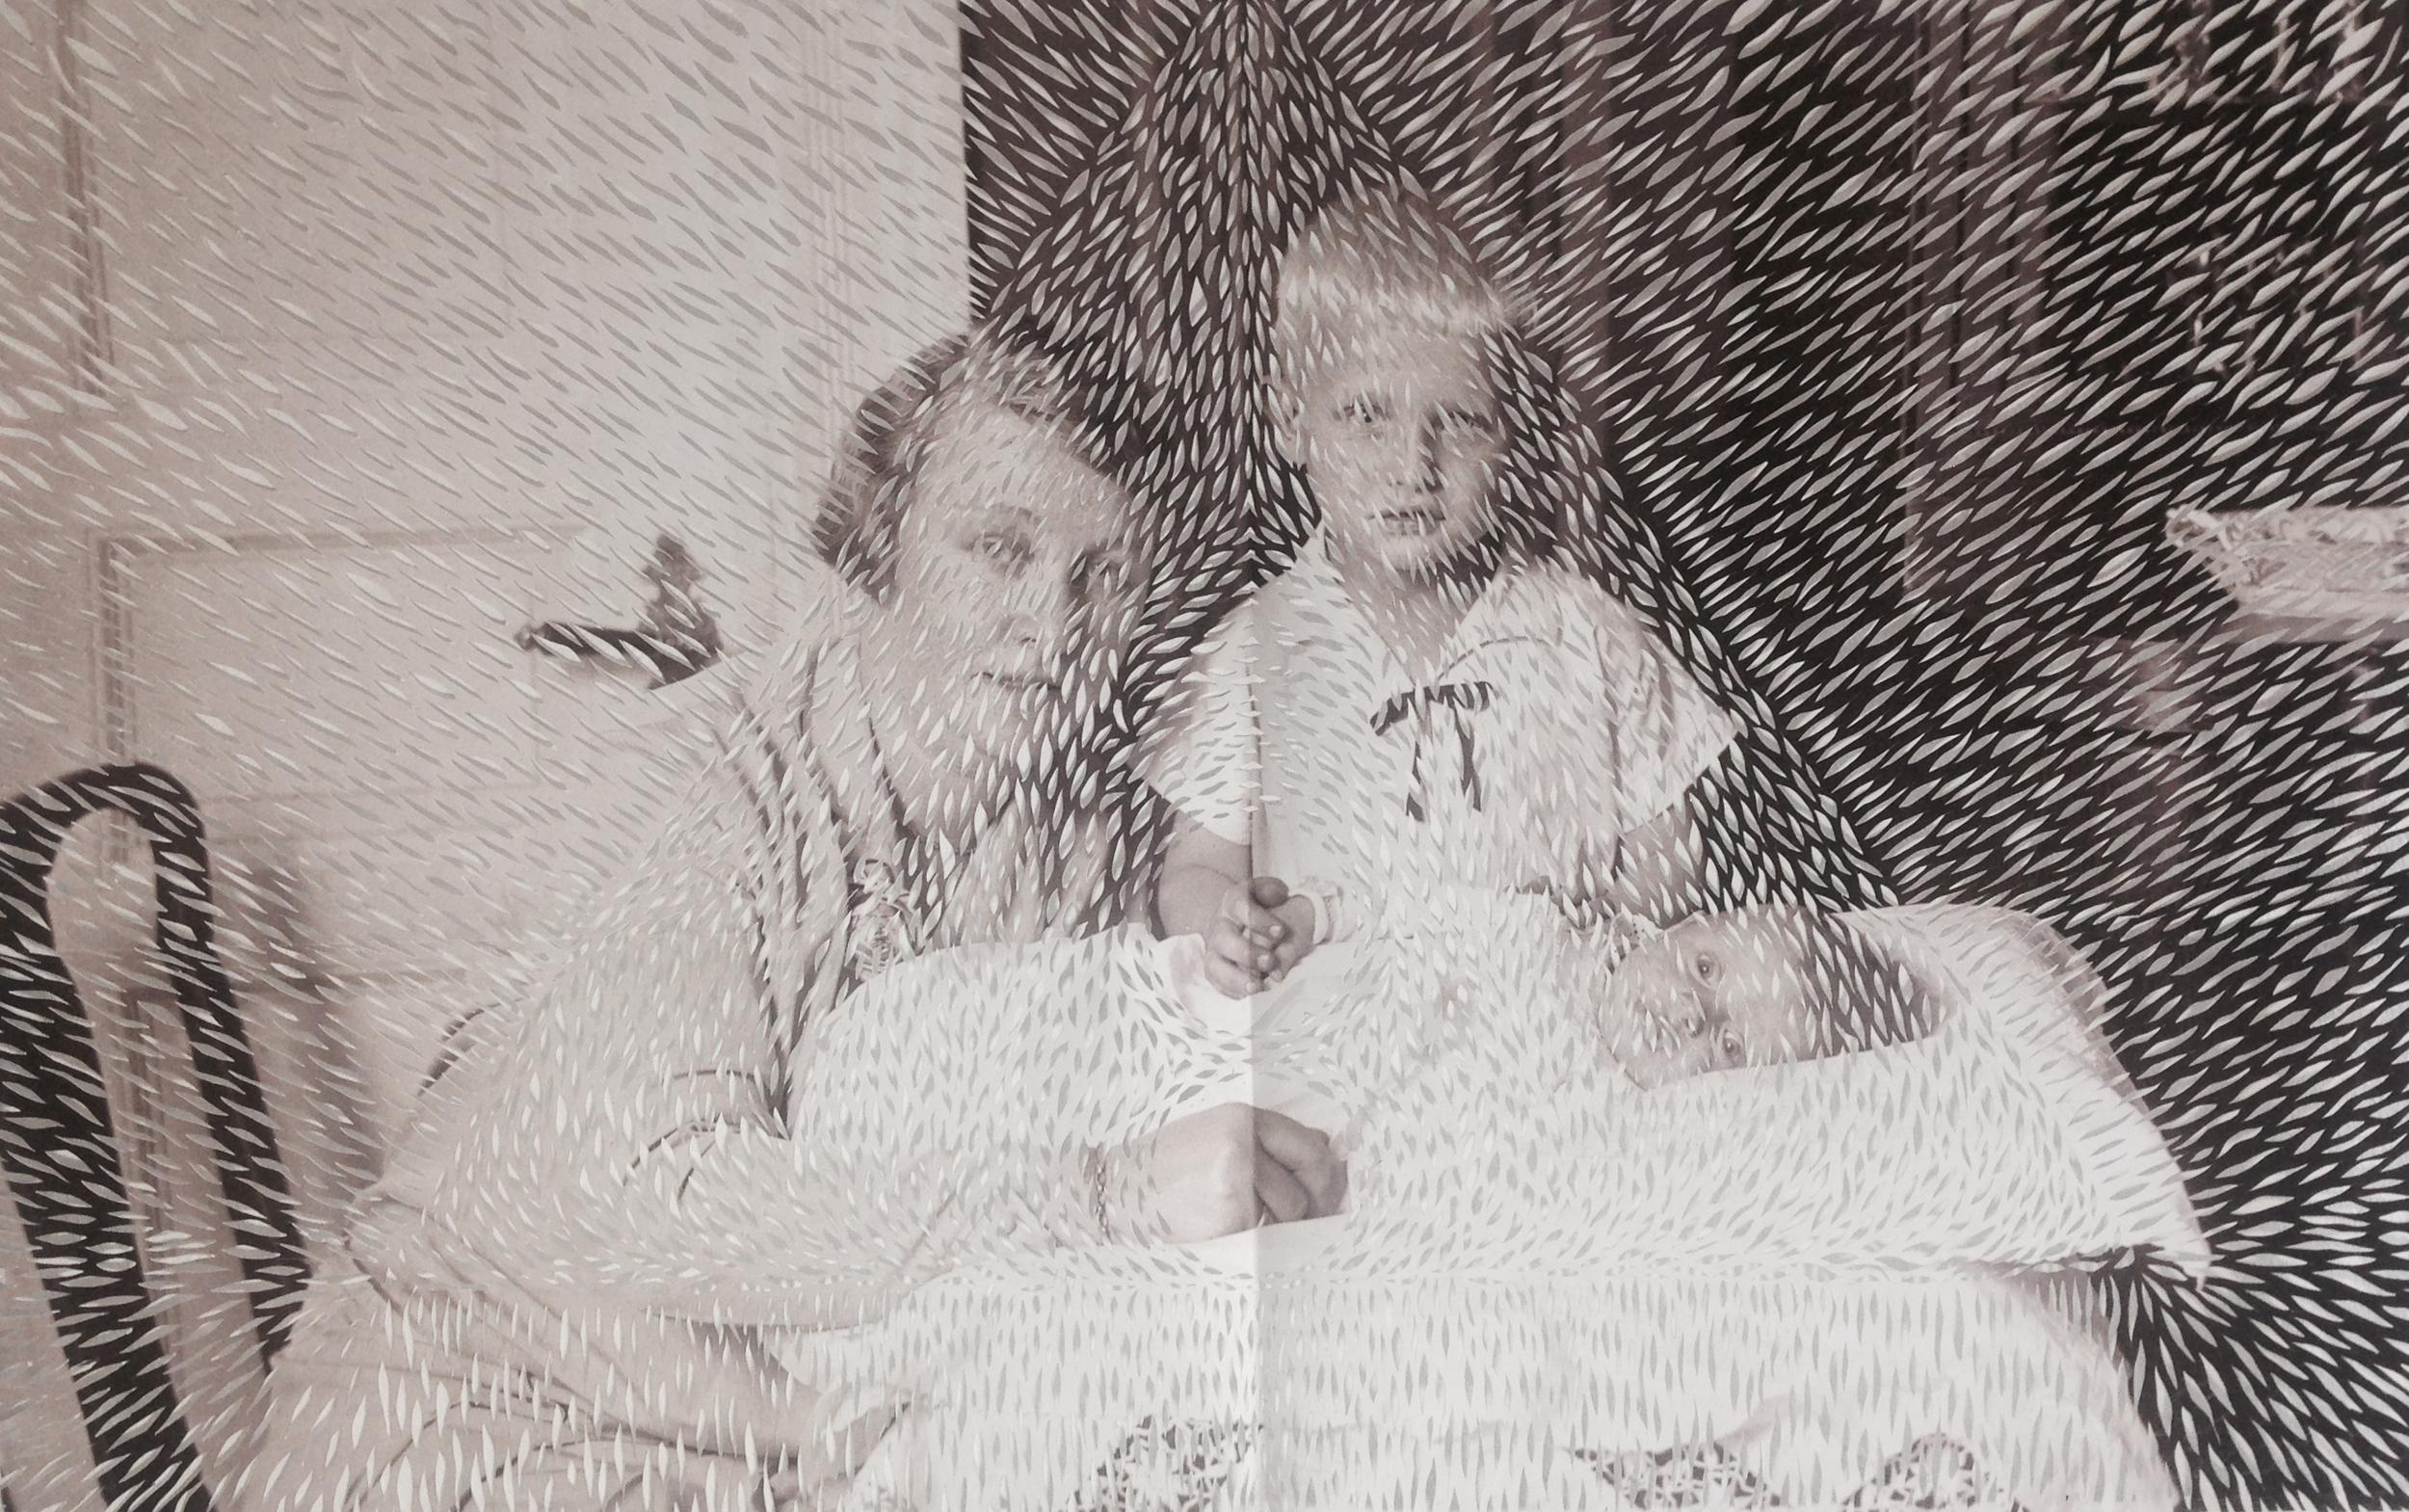 IMG_1856-35.jpg